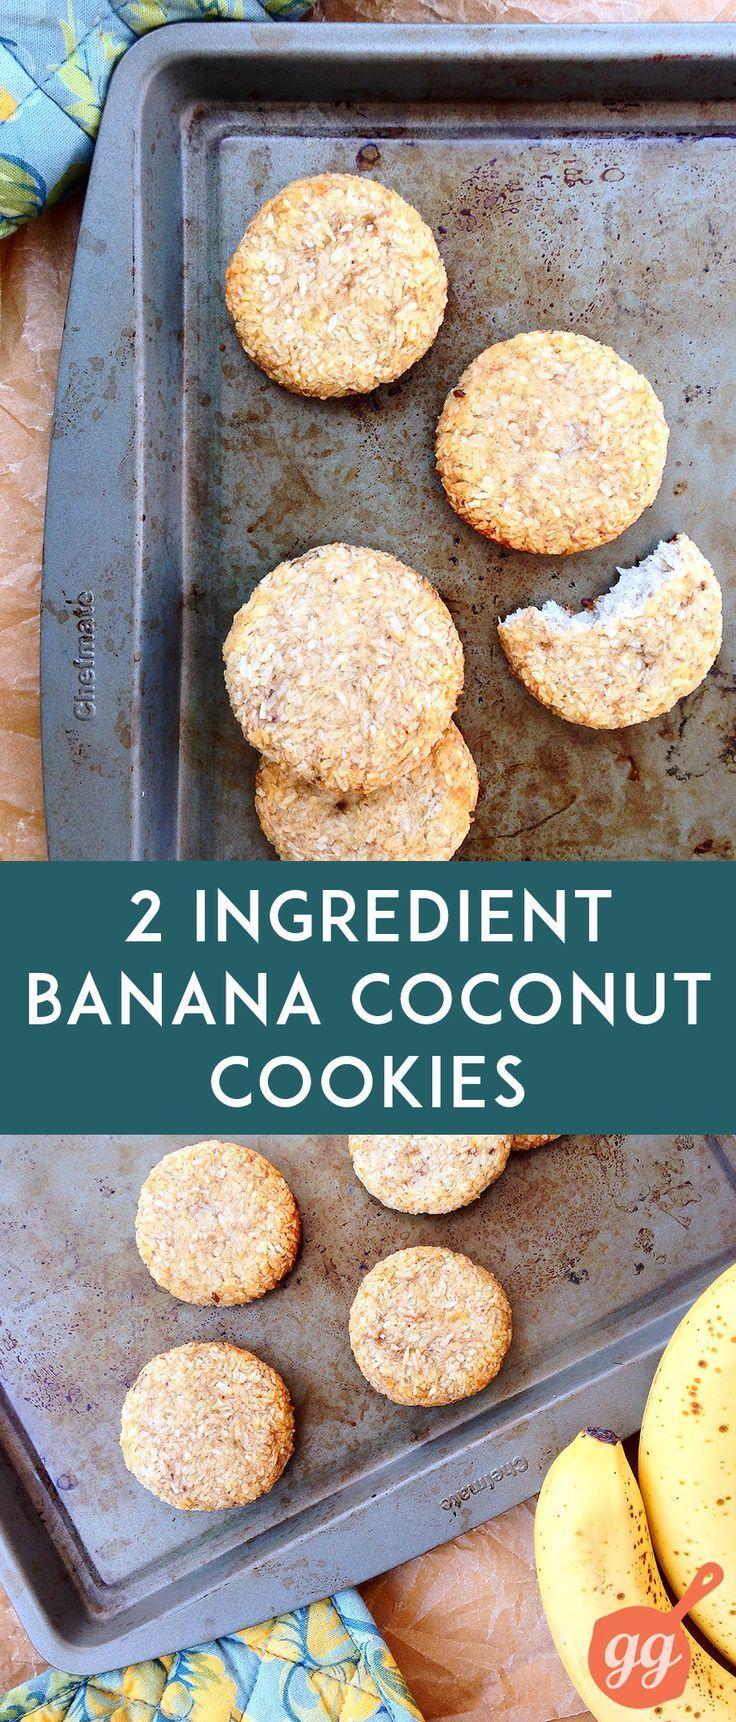 The name says it all! 2 Ingredient Banana Coconut Cookies | #paleo #vegan #healthy